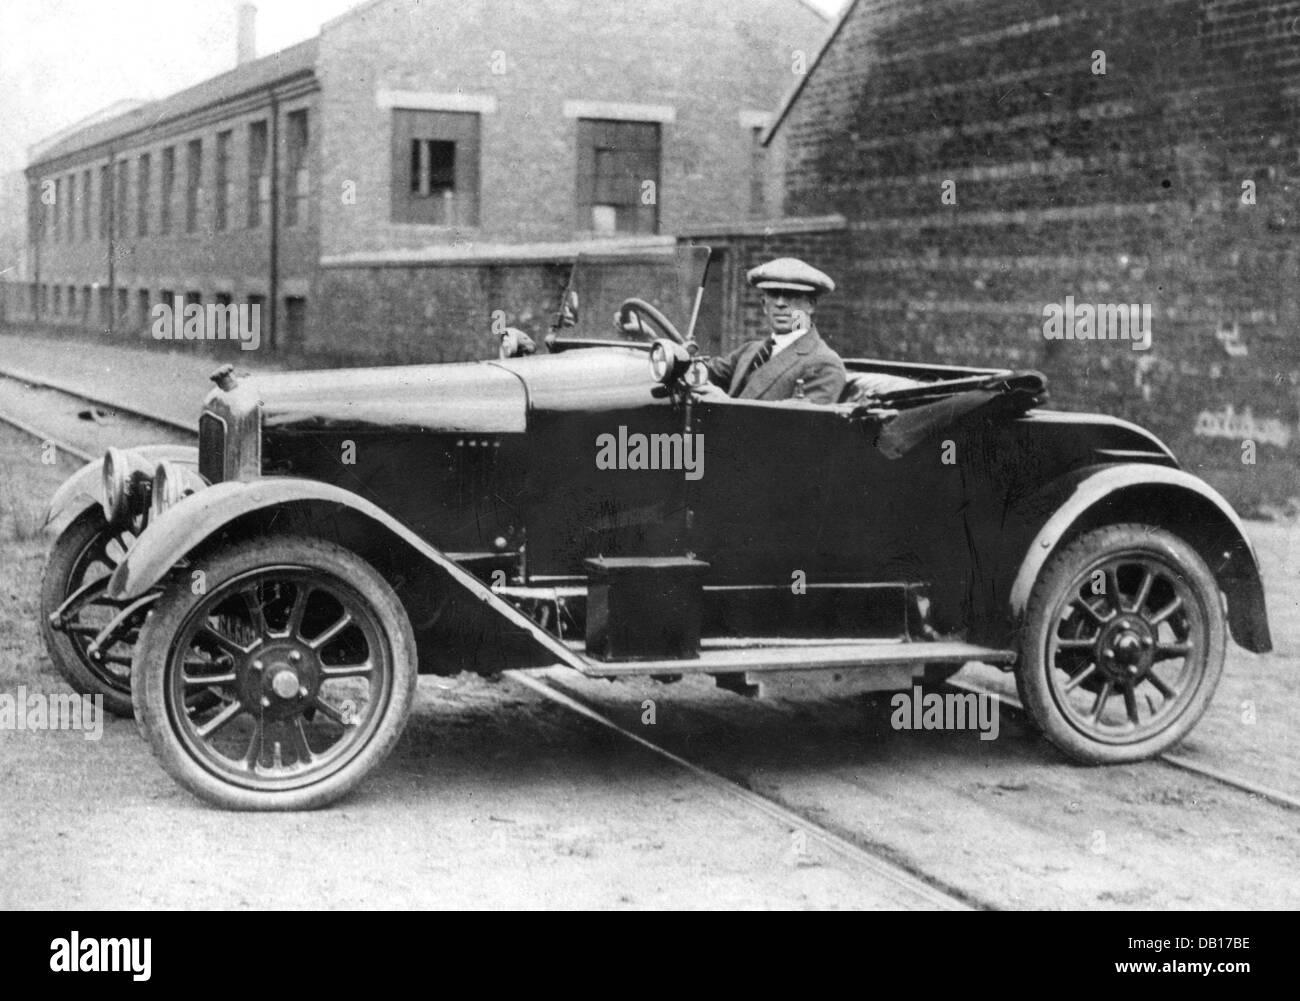 1921 Beardmore Eleven - Stock Image